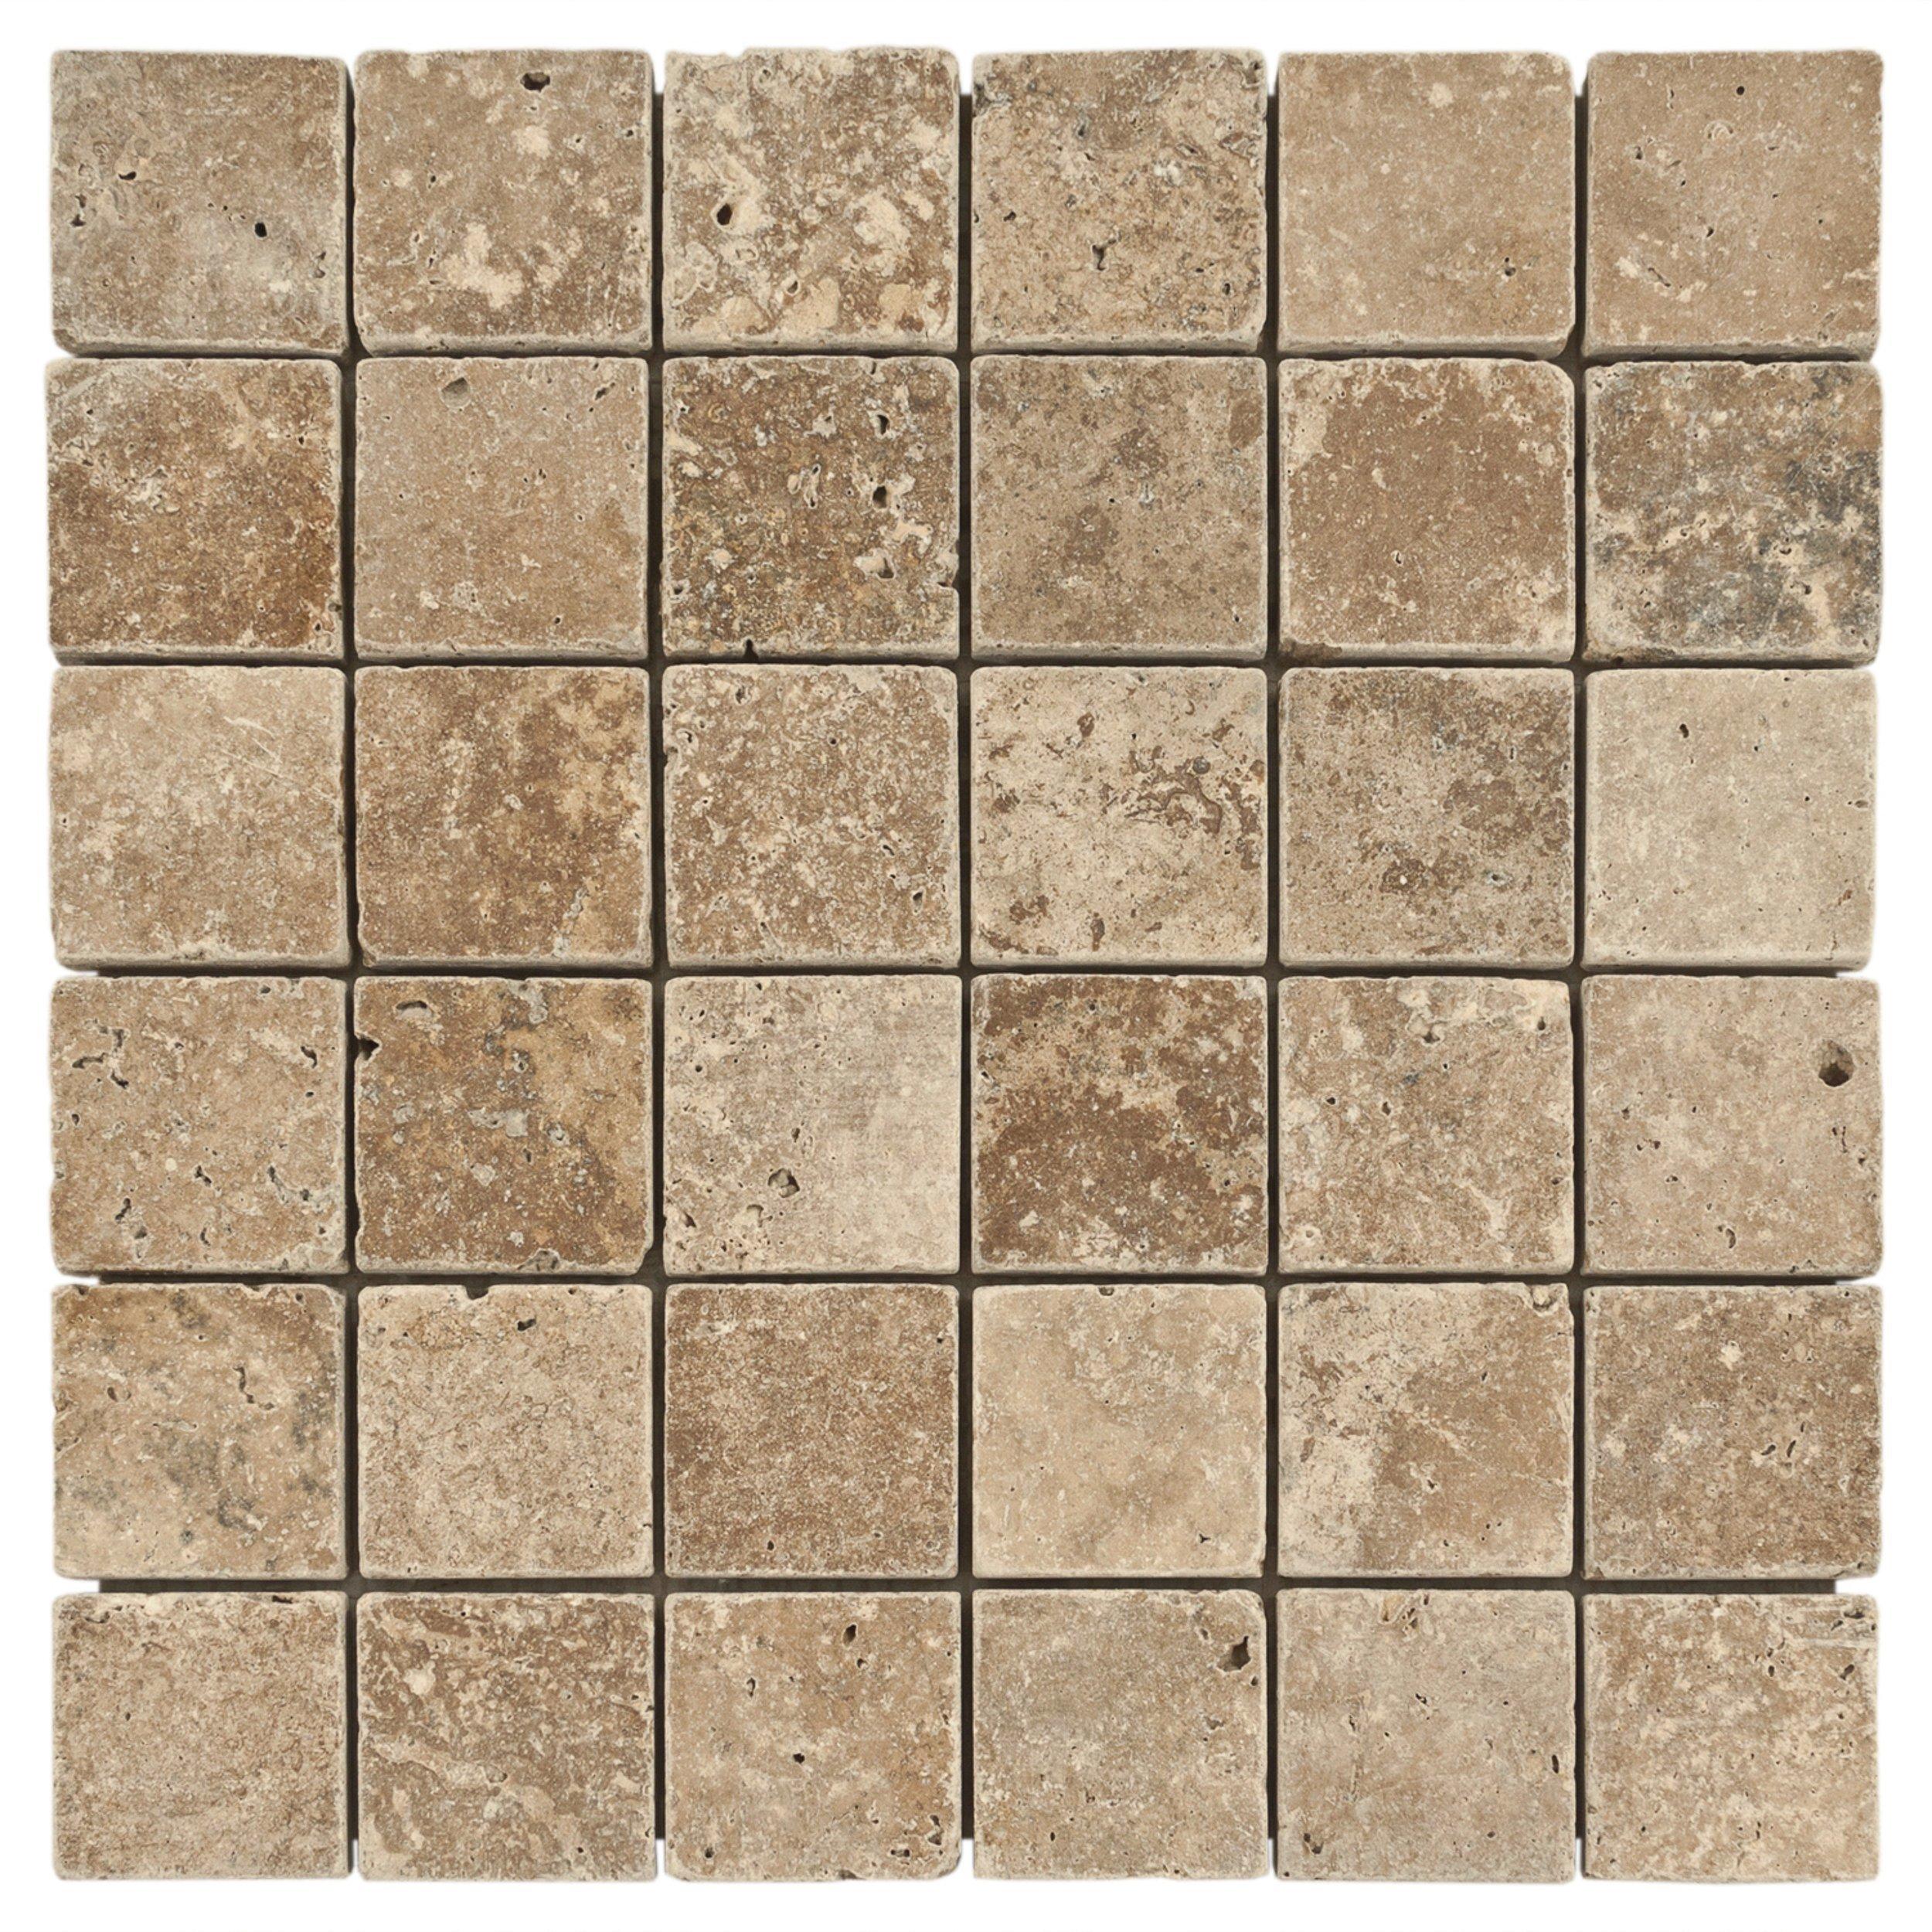 Travertine Stone Tile Floor Amp Decor